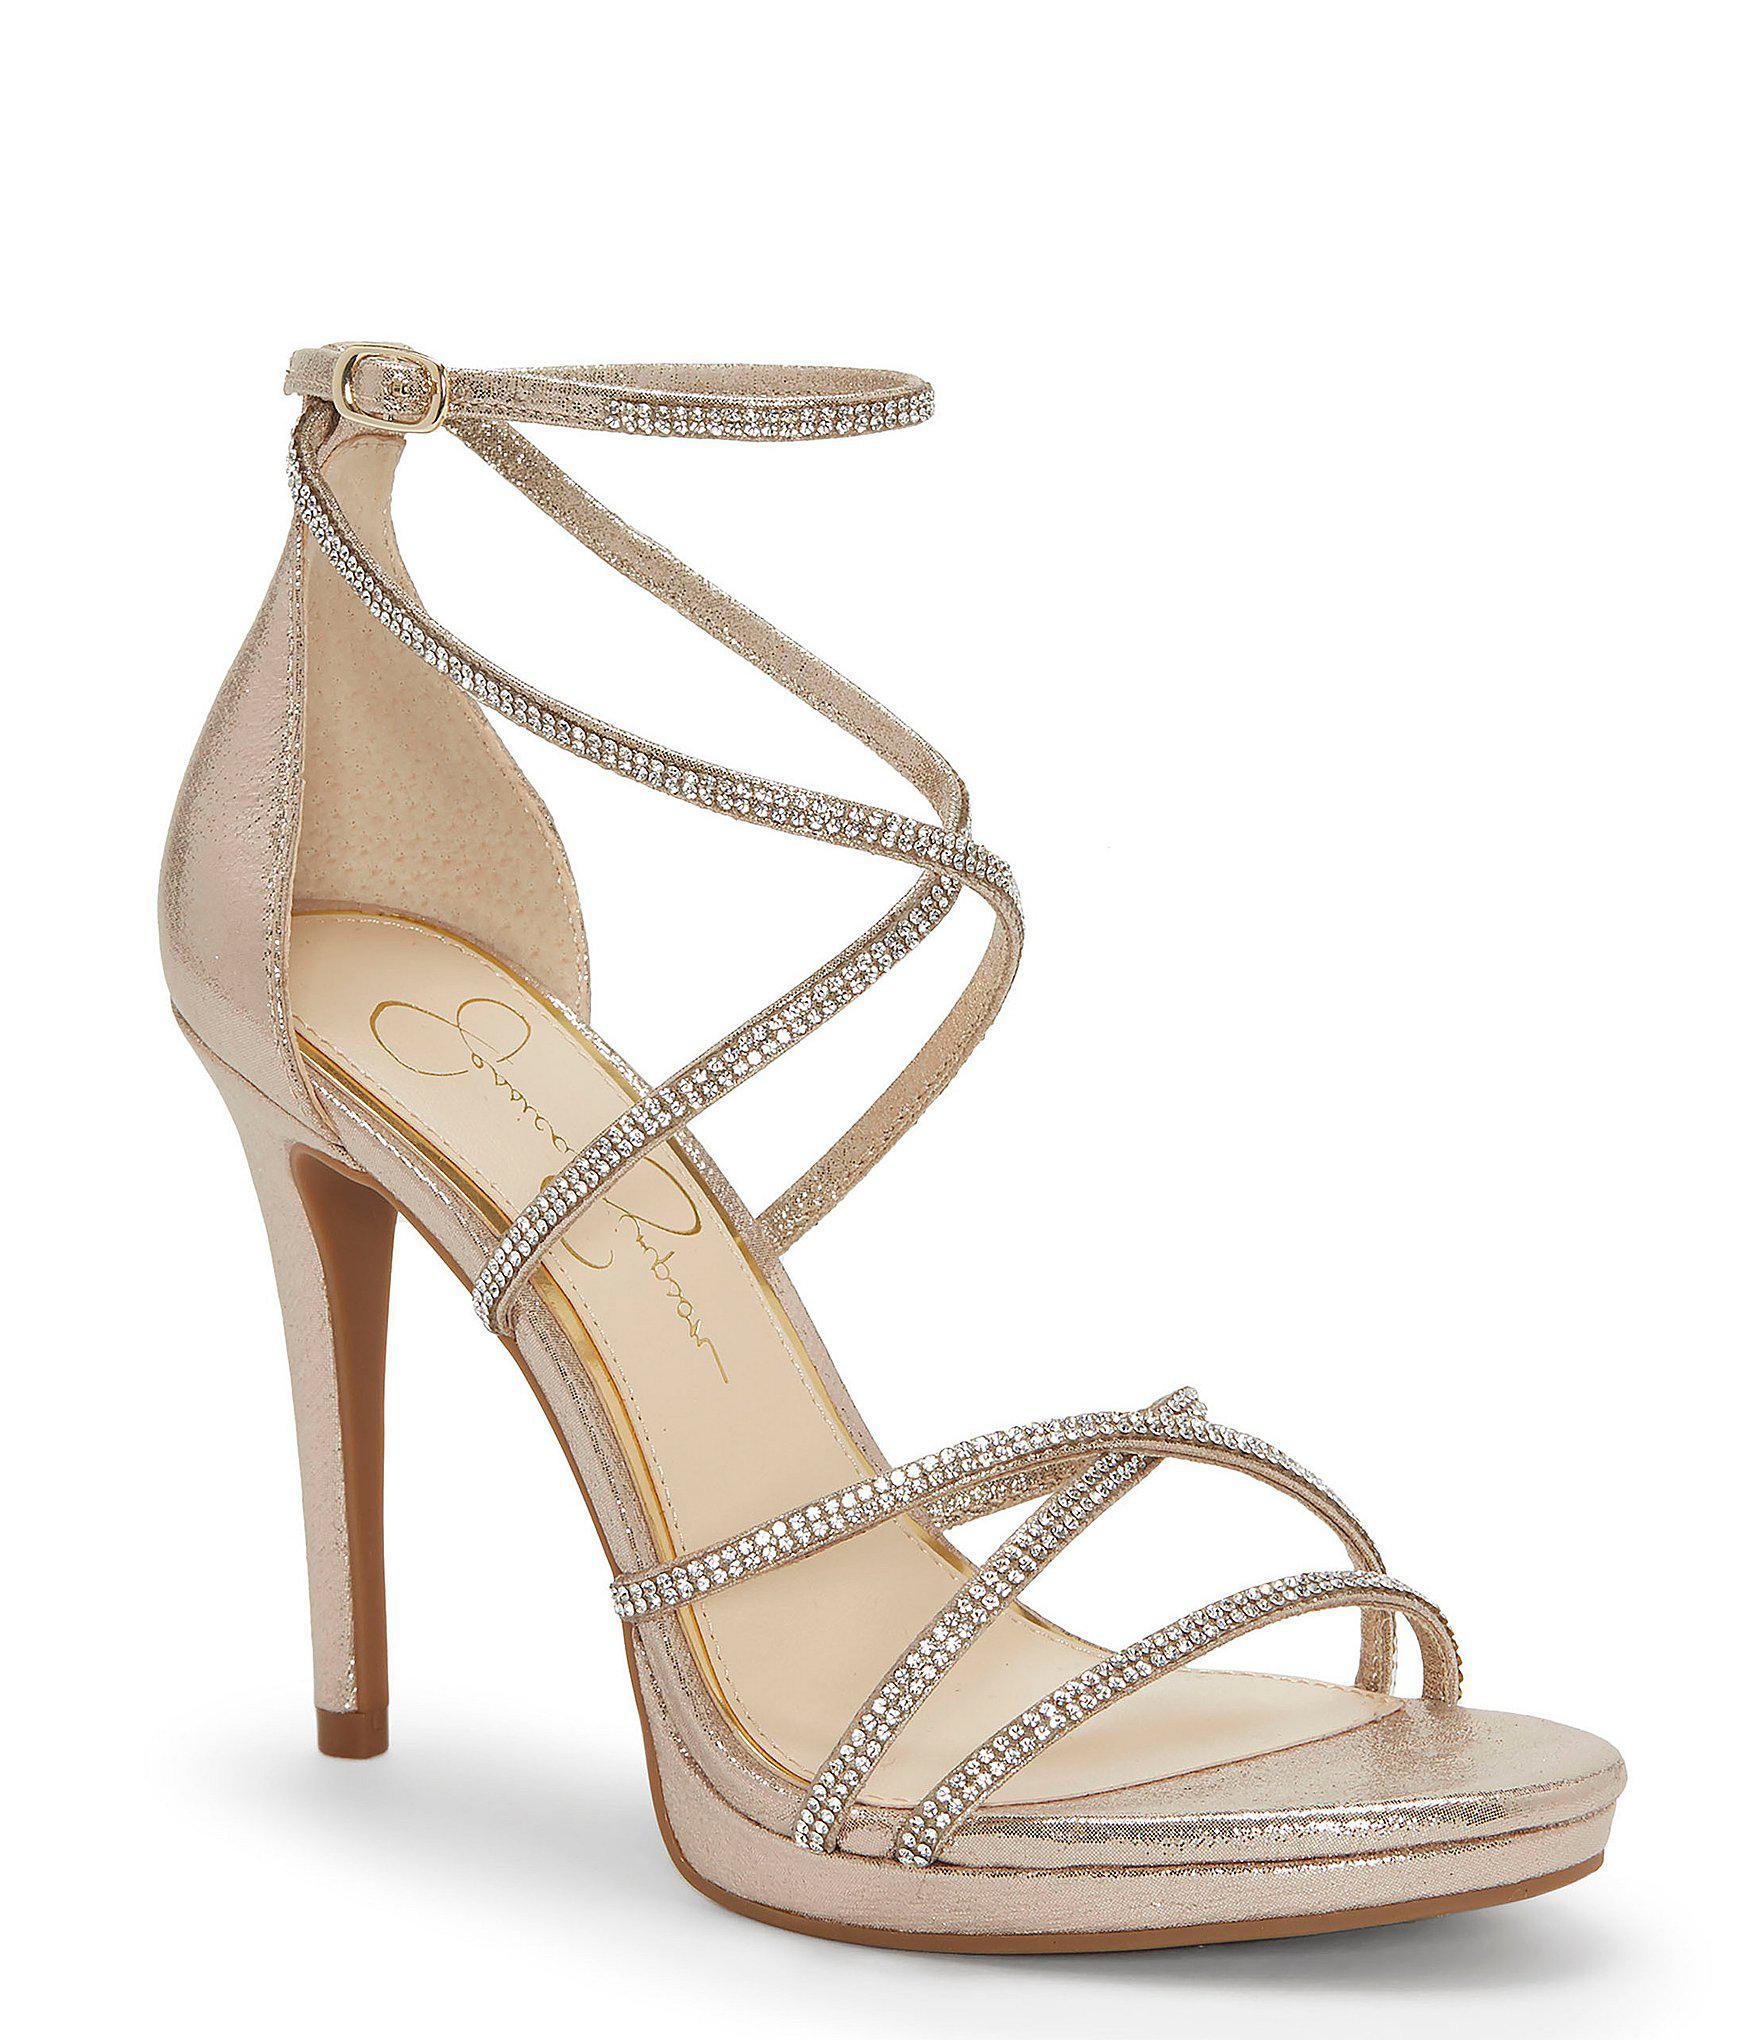 da8ee29f4040 Jessica Simpson. Women s Metallic Jaeya Rhinestone Strappy Dress Sandals